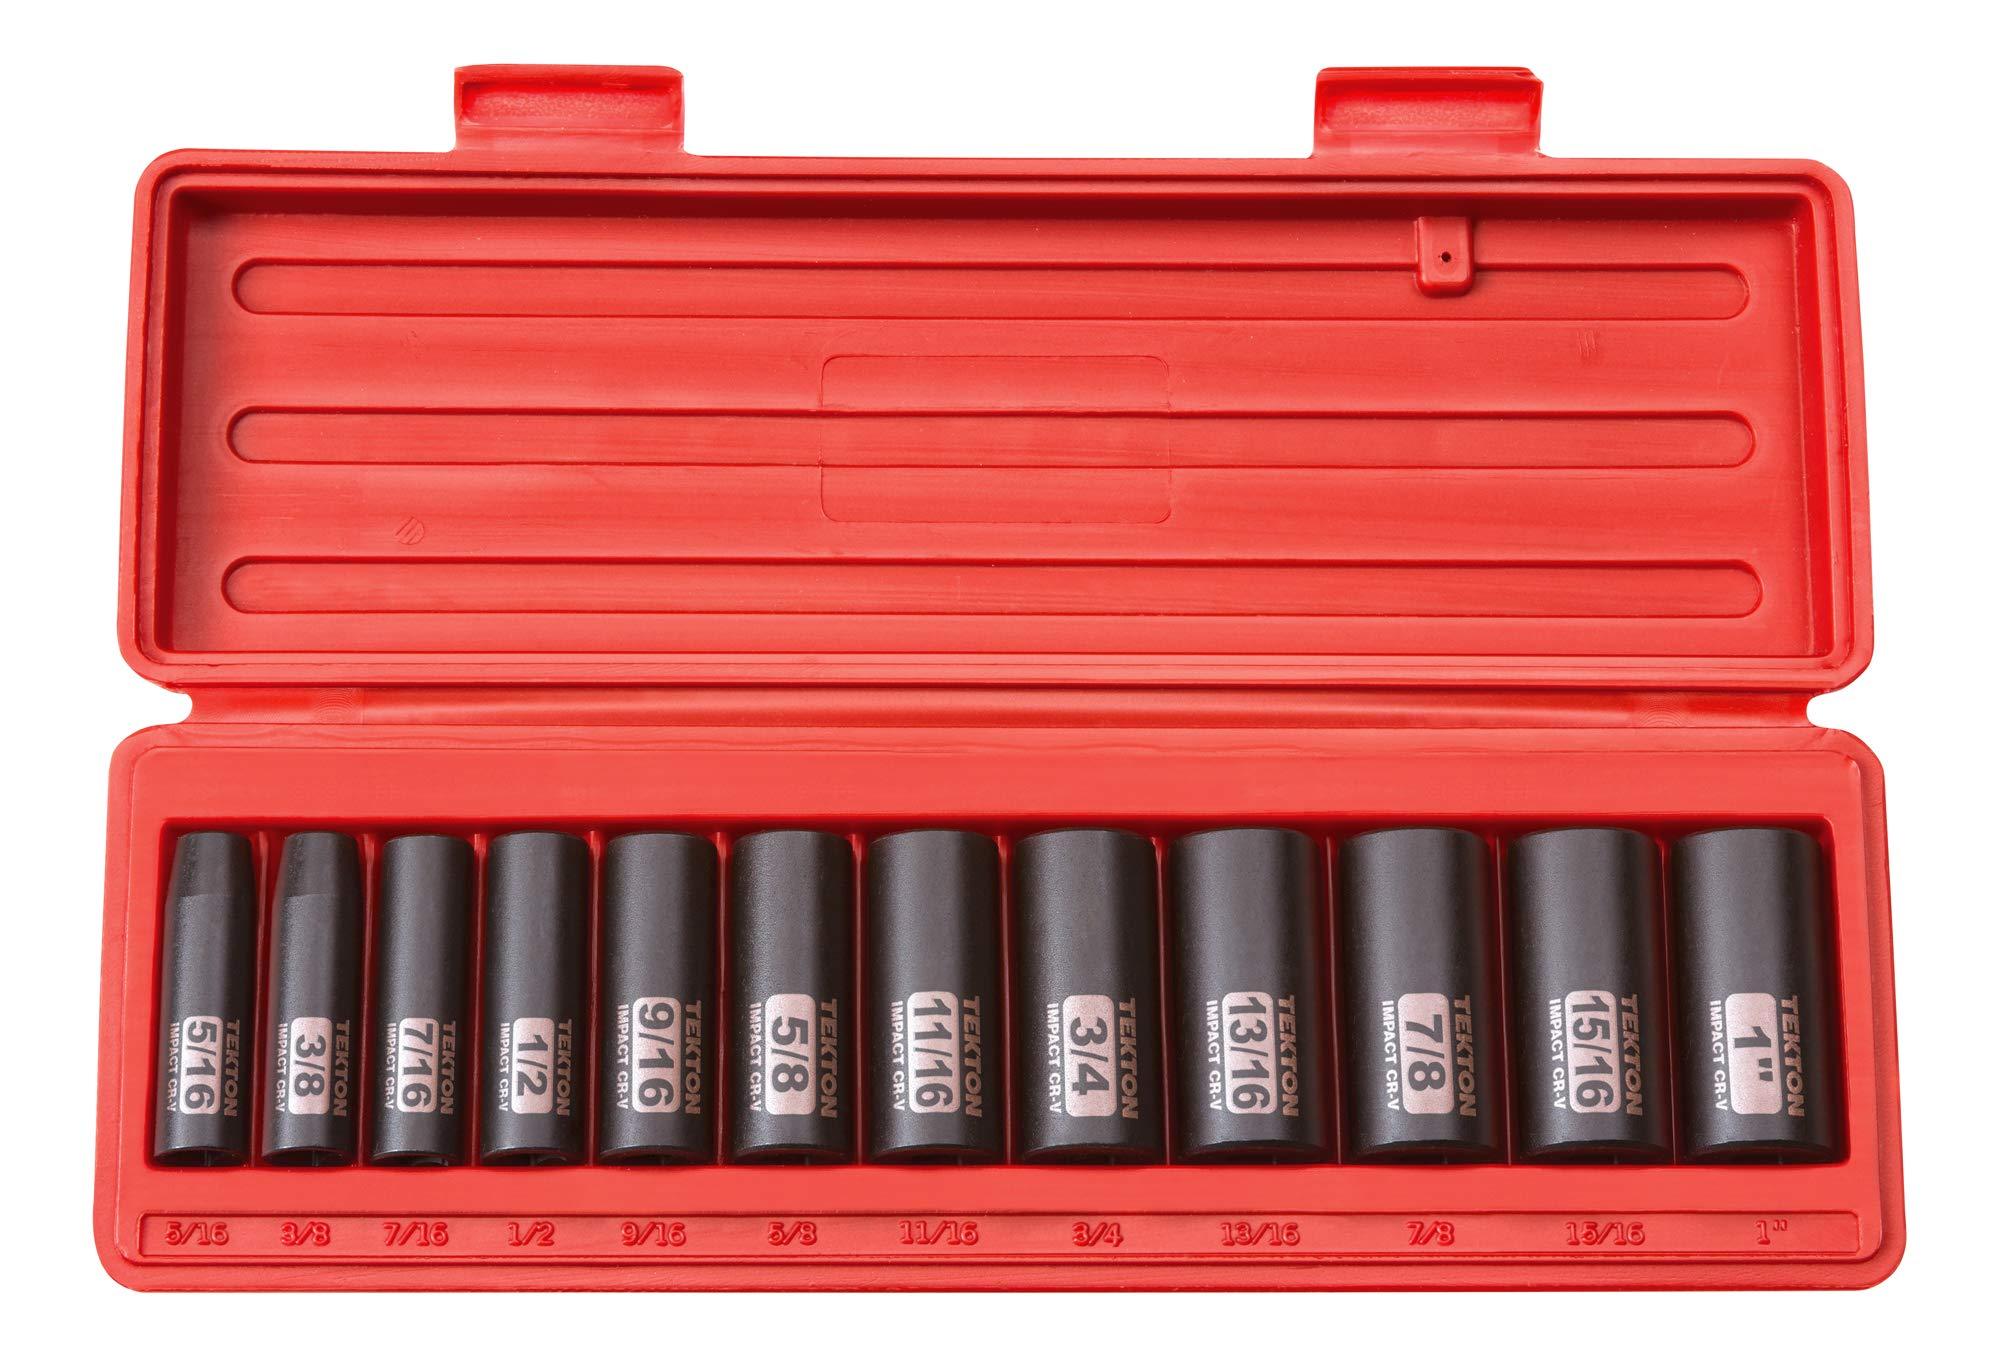 TEKTON 3/8 Inch Drive Deep 12-Point Impact Socket Set, 12-Piece (5/16-1 in.) | 47921